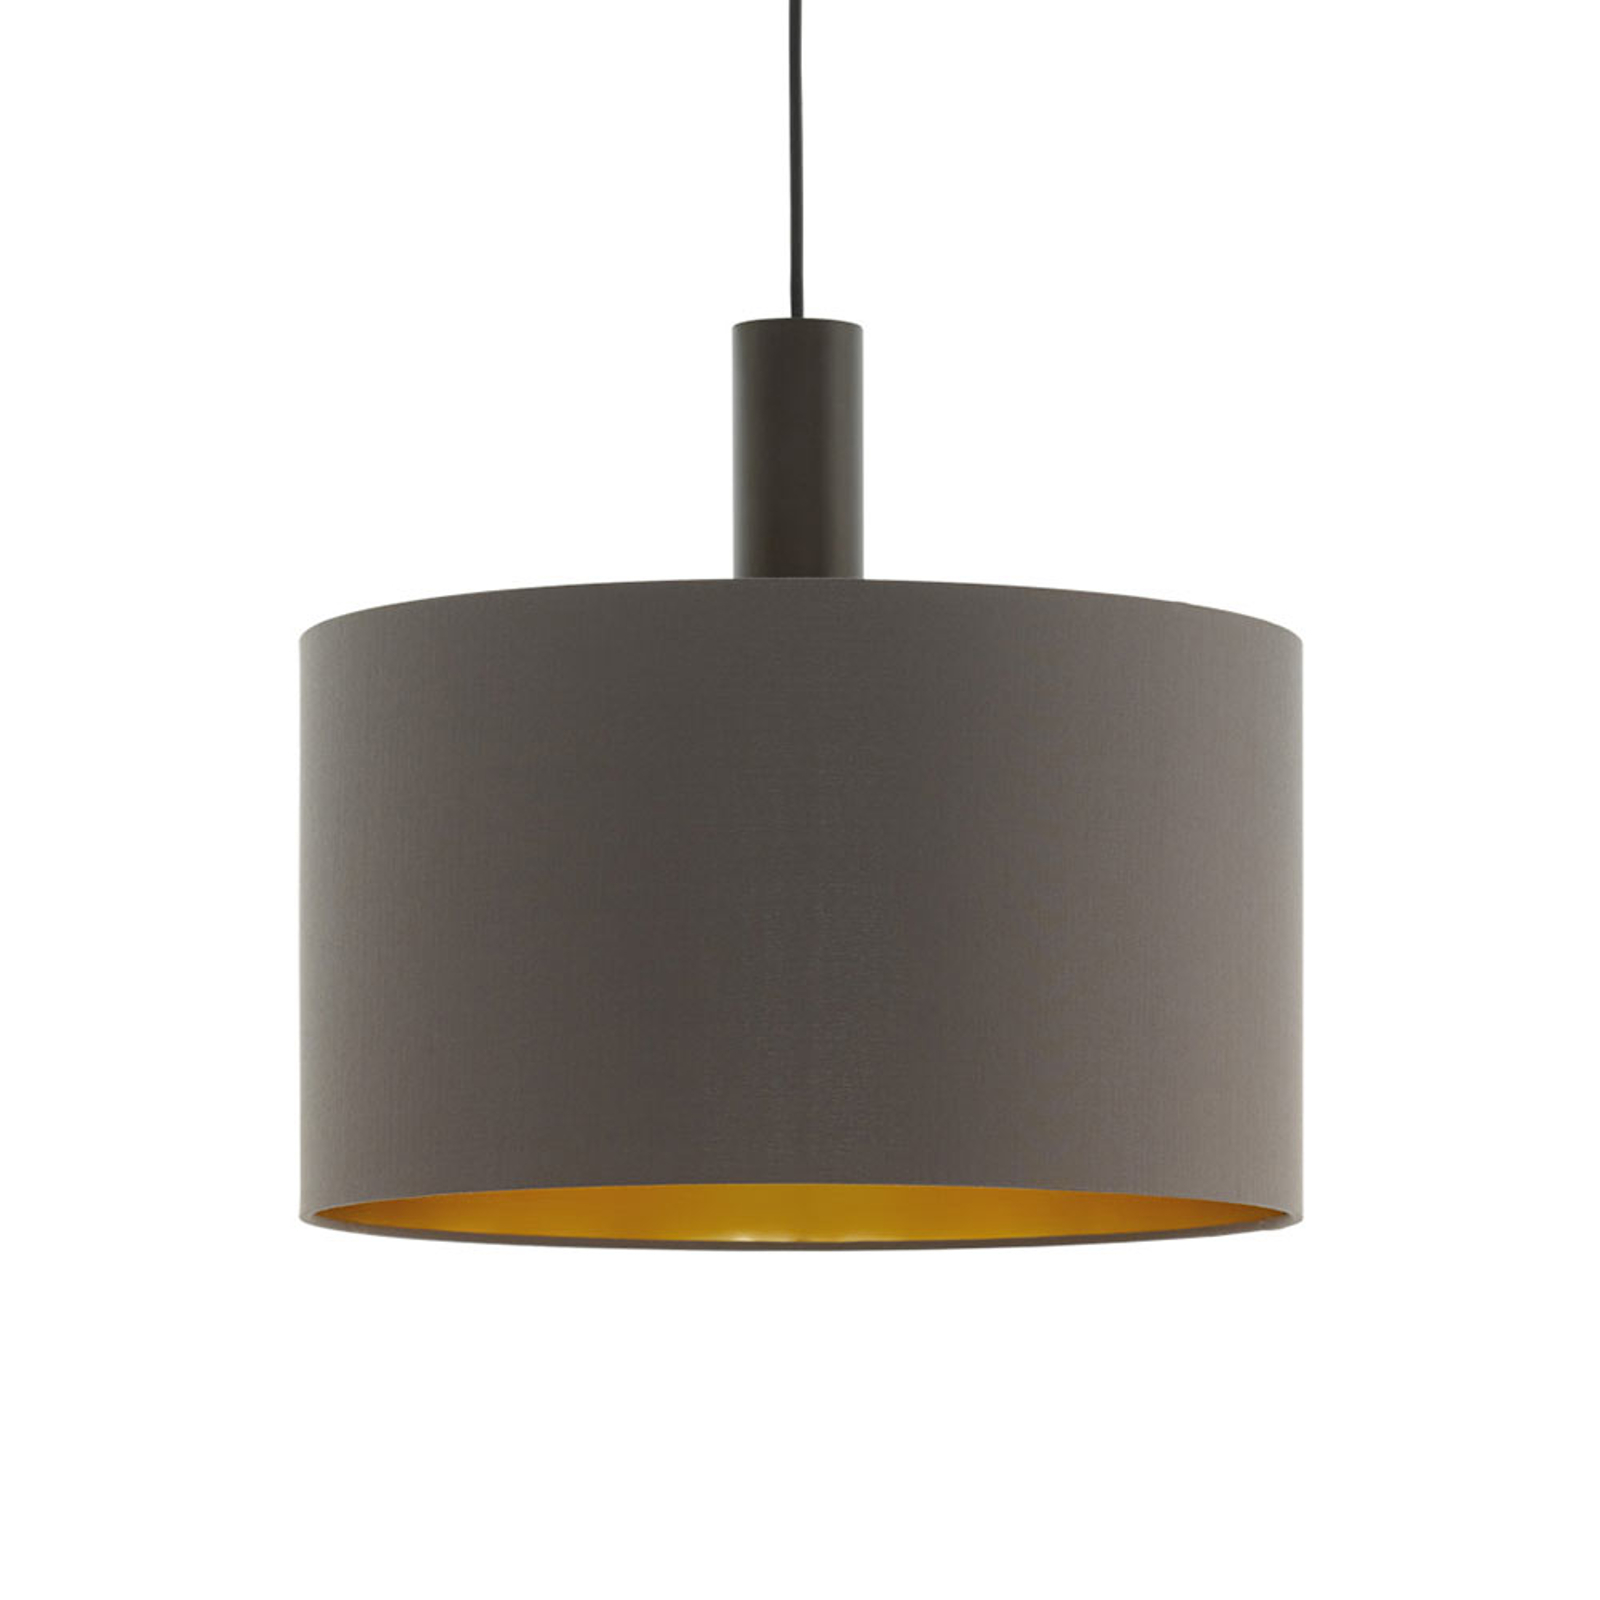 Lampa wisząca Concessa cappuccino/złoty Ø 38 cm